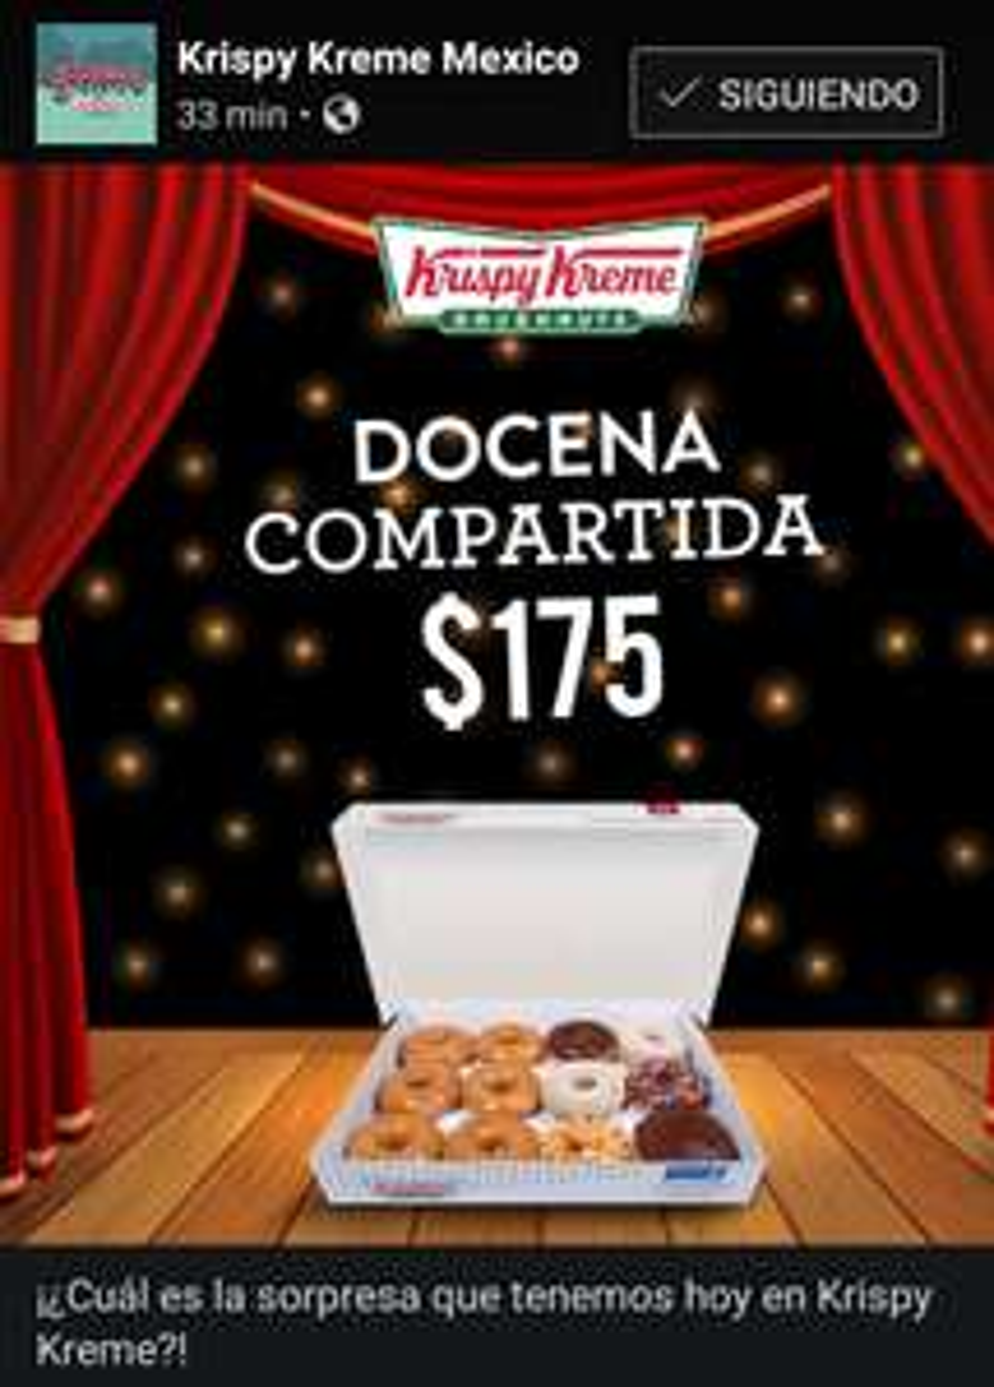 Krispy Kreme: Solo Hoy Docena Compartida